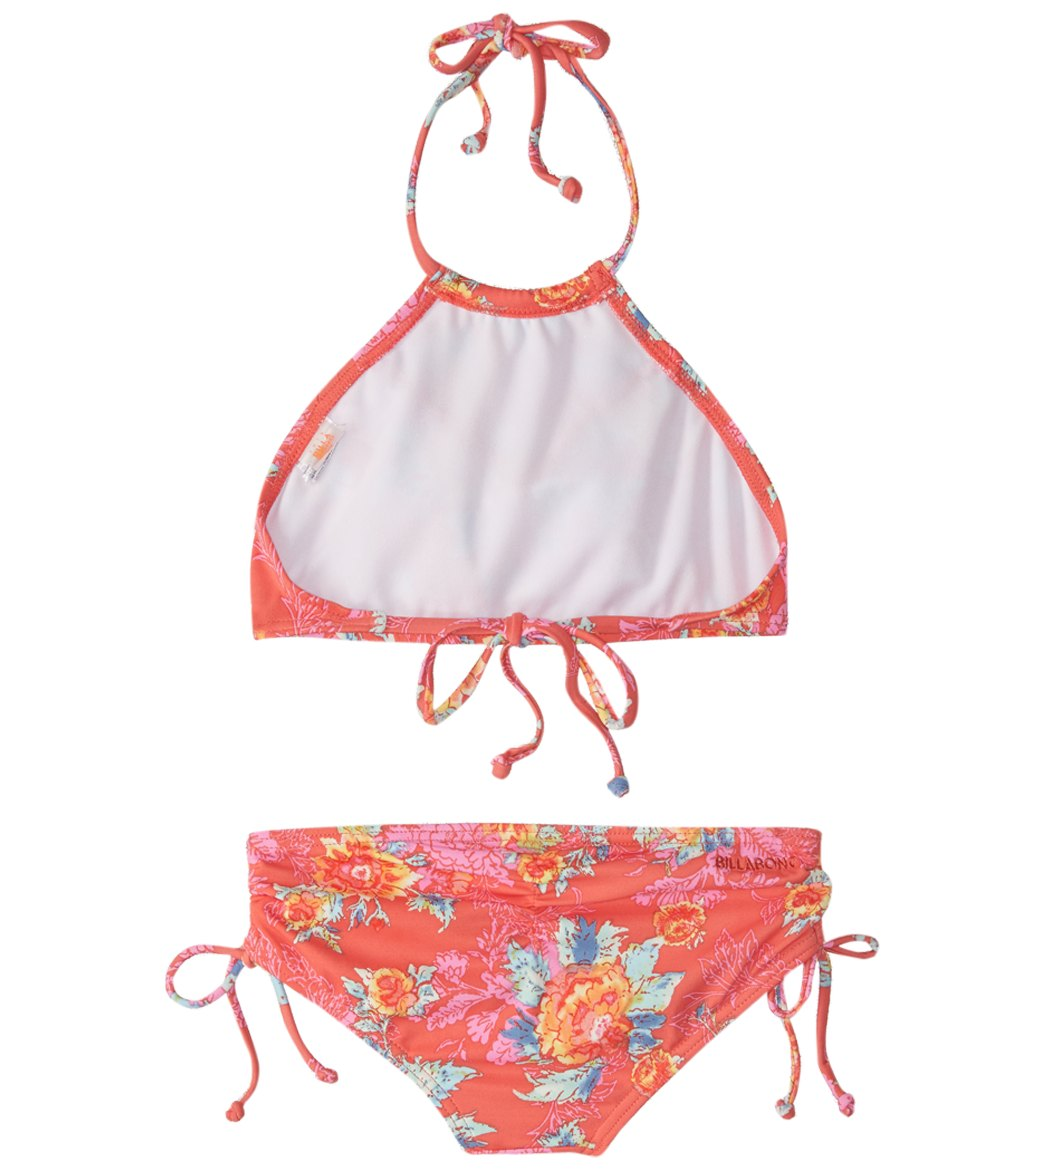 32659b3b30bd9 Billabong Girls  Rosie Daze High Neck Bikini Set (4-14) at ...